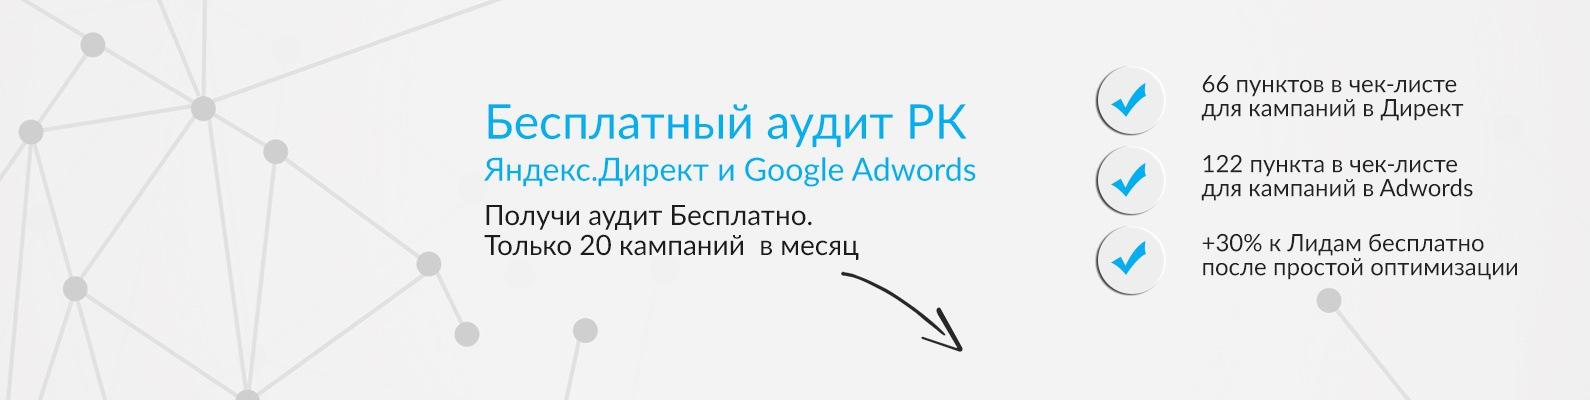 Бесплатный аудит яндекс директ google adwords customer support phone number